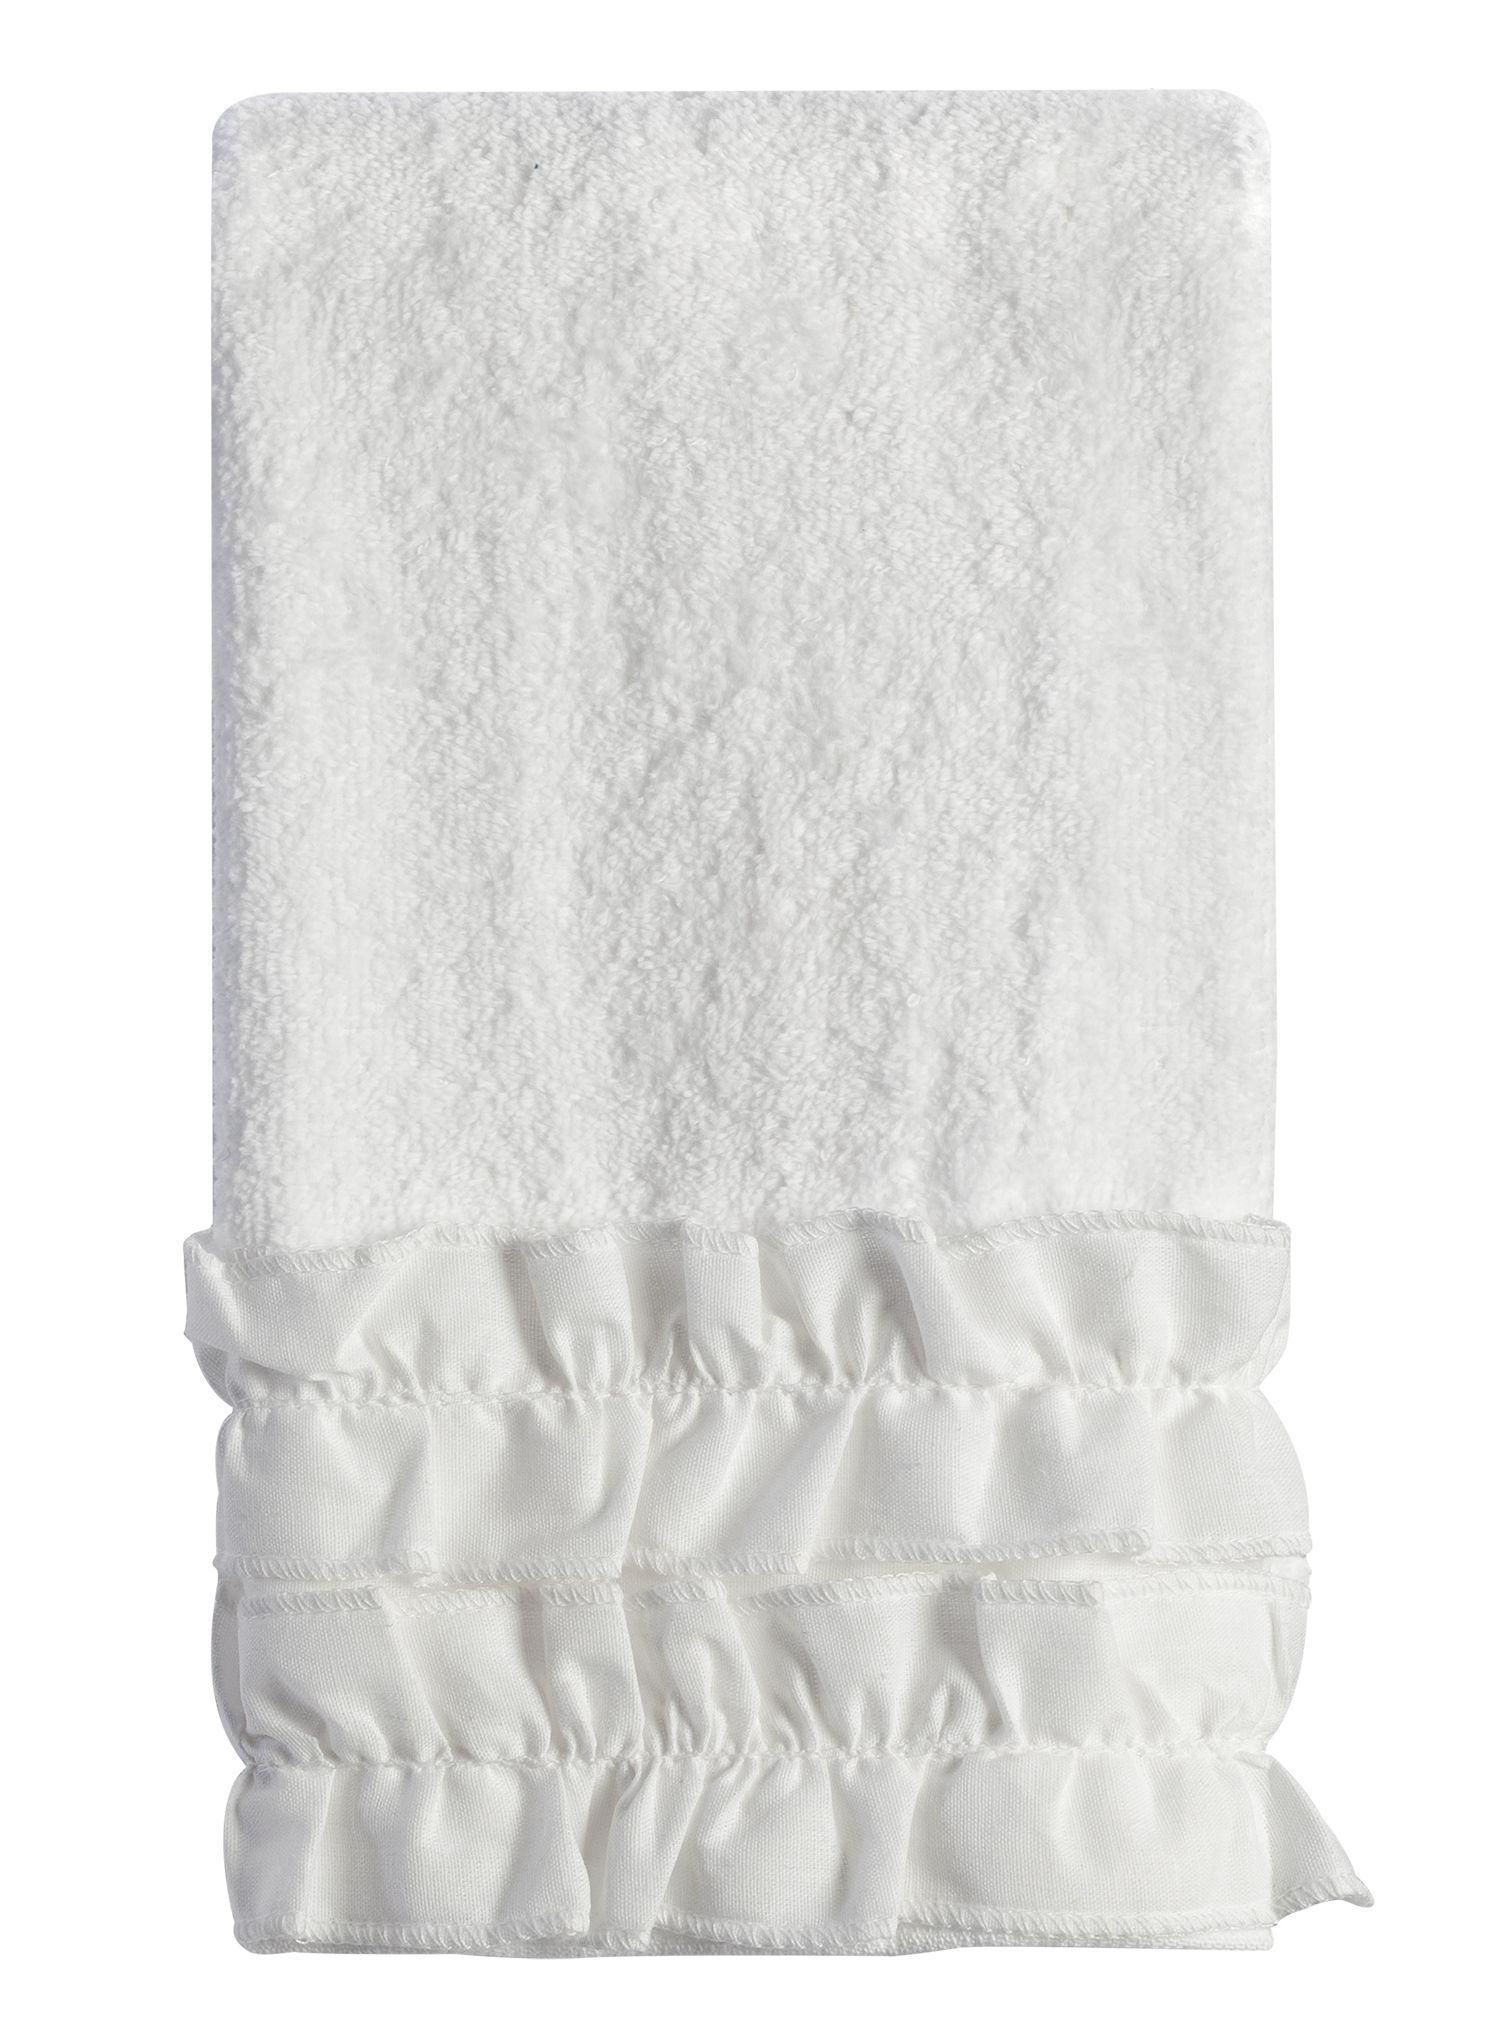 Полотенца Полотенце 27х42 Creative Bath Ruffles белое polotentse-mahrovoe-27h42-creative-bath-ruffles-ssha-indiya.jpg